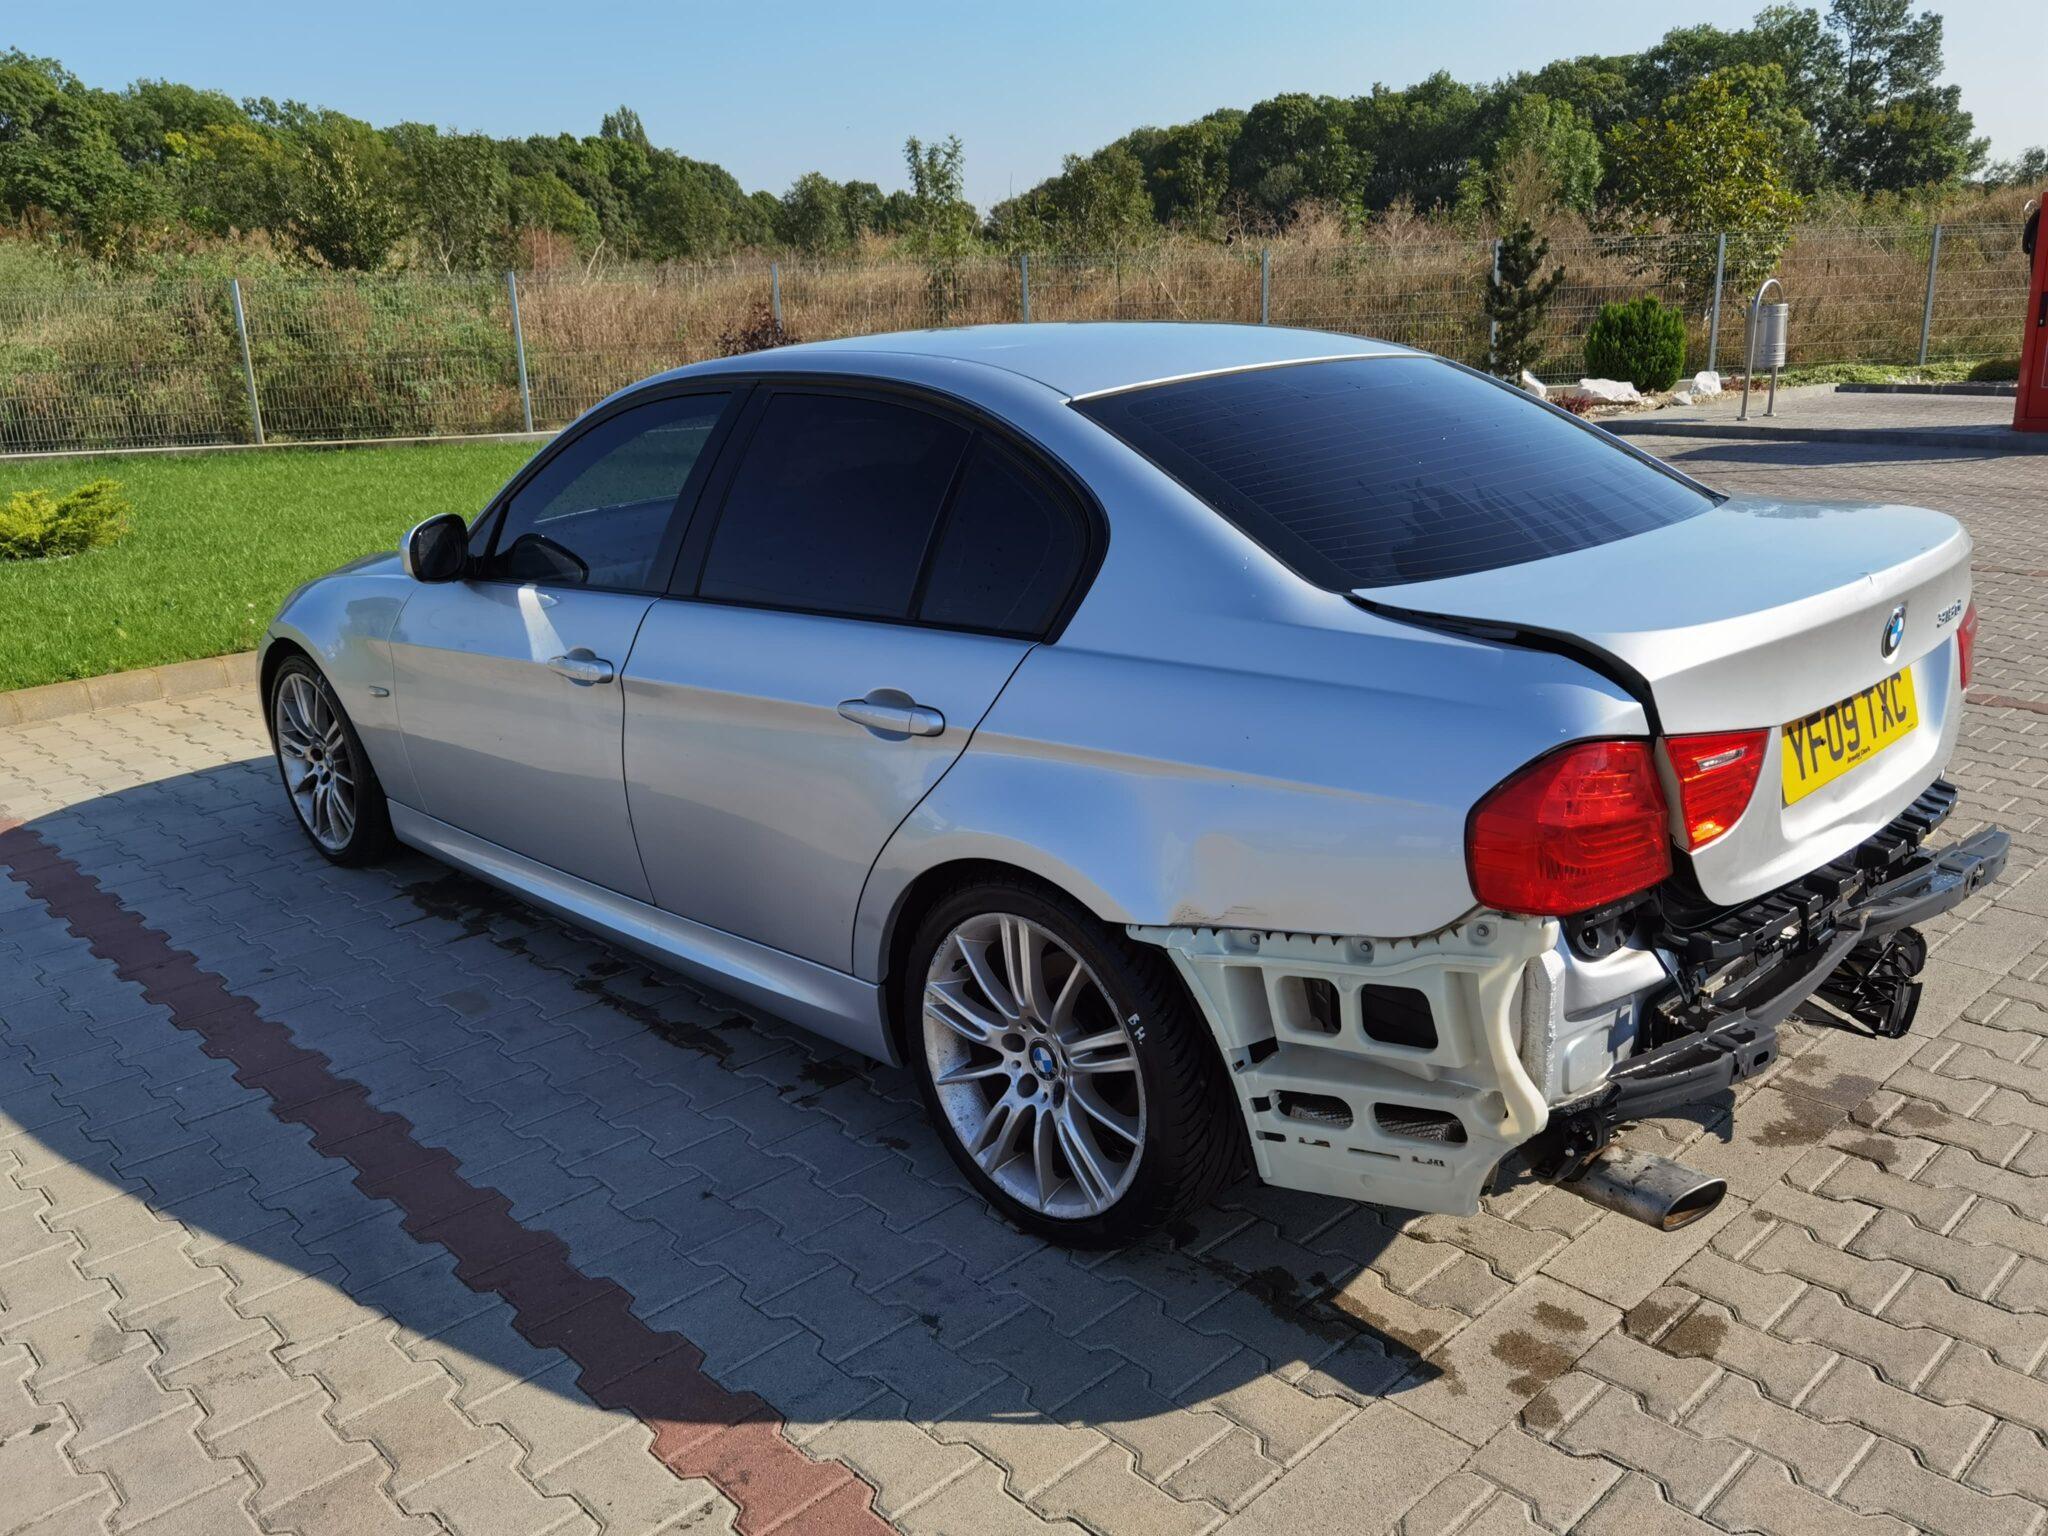 BMW E90 lci 318d Carbon Car Center Békéscsaba-6